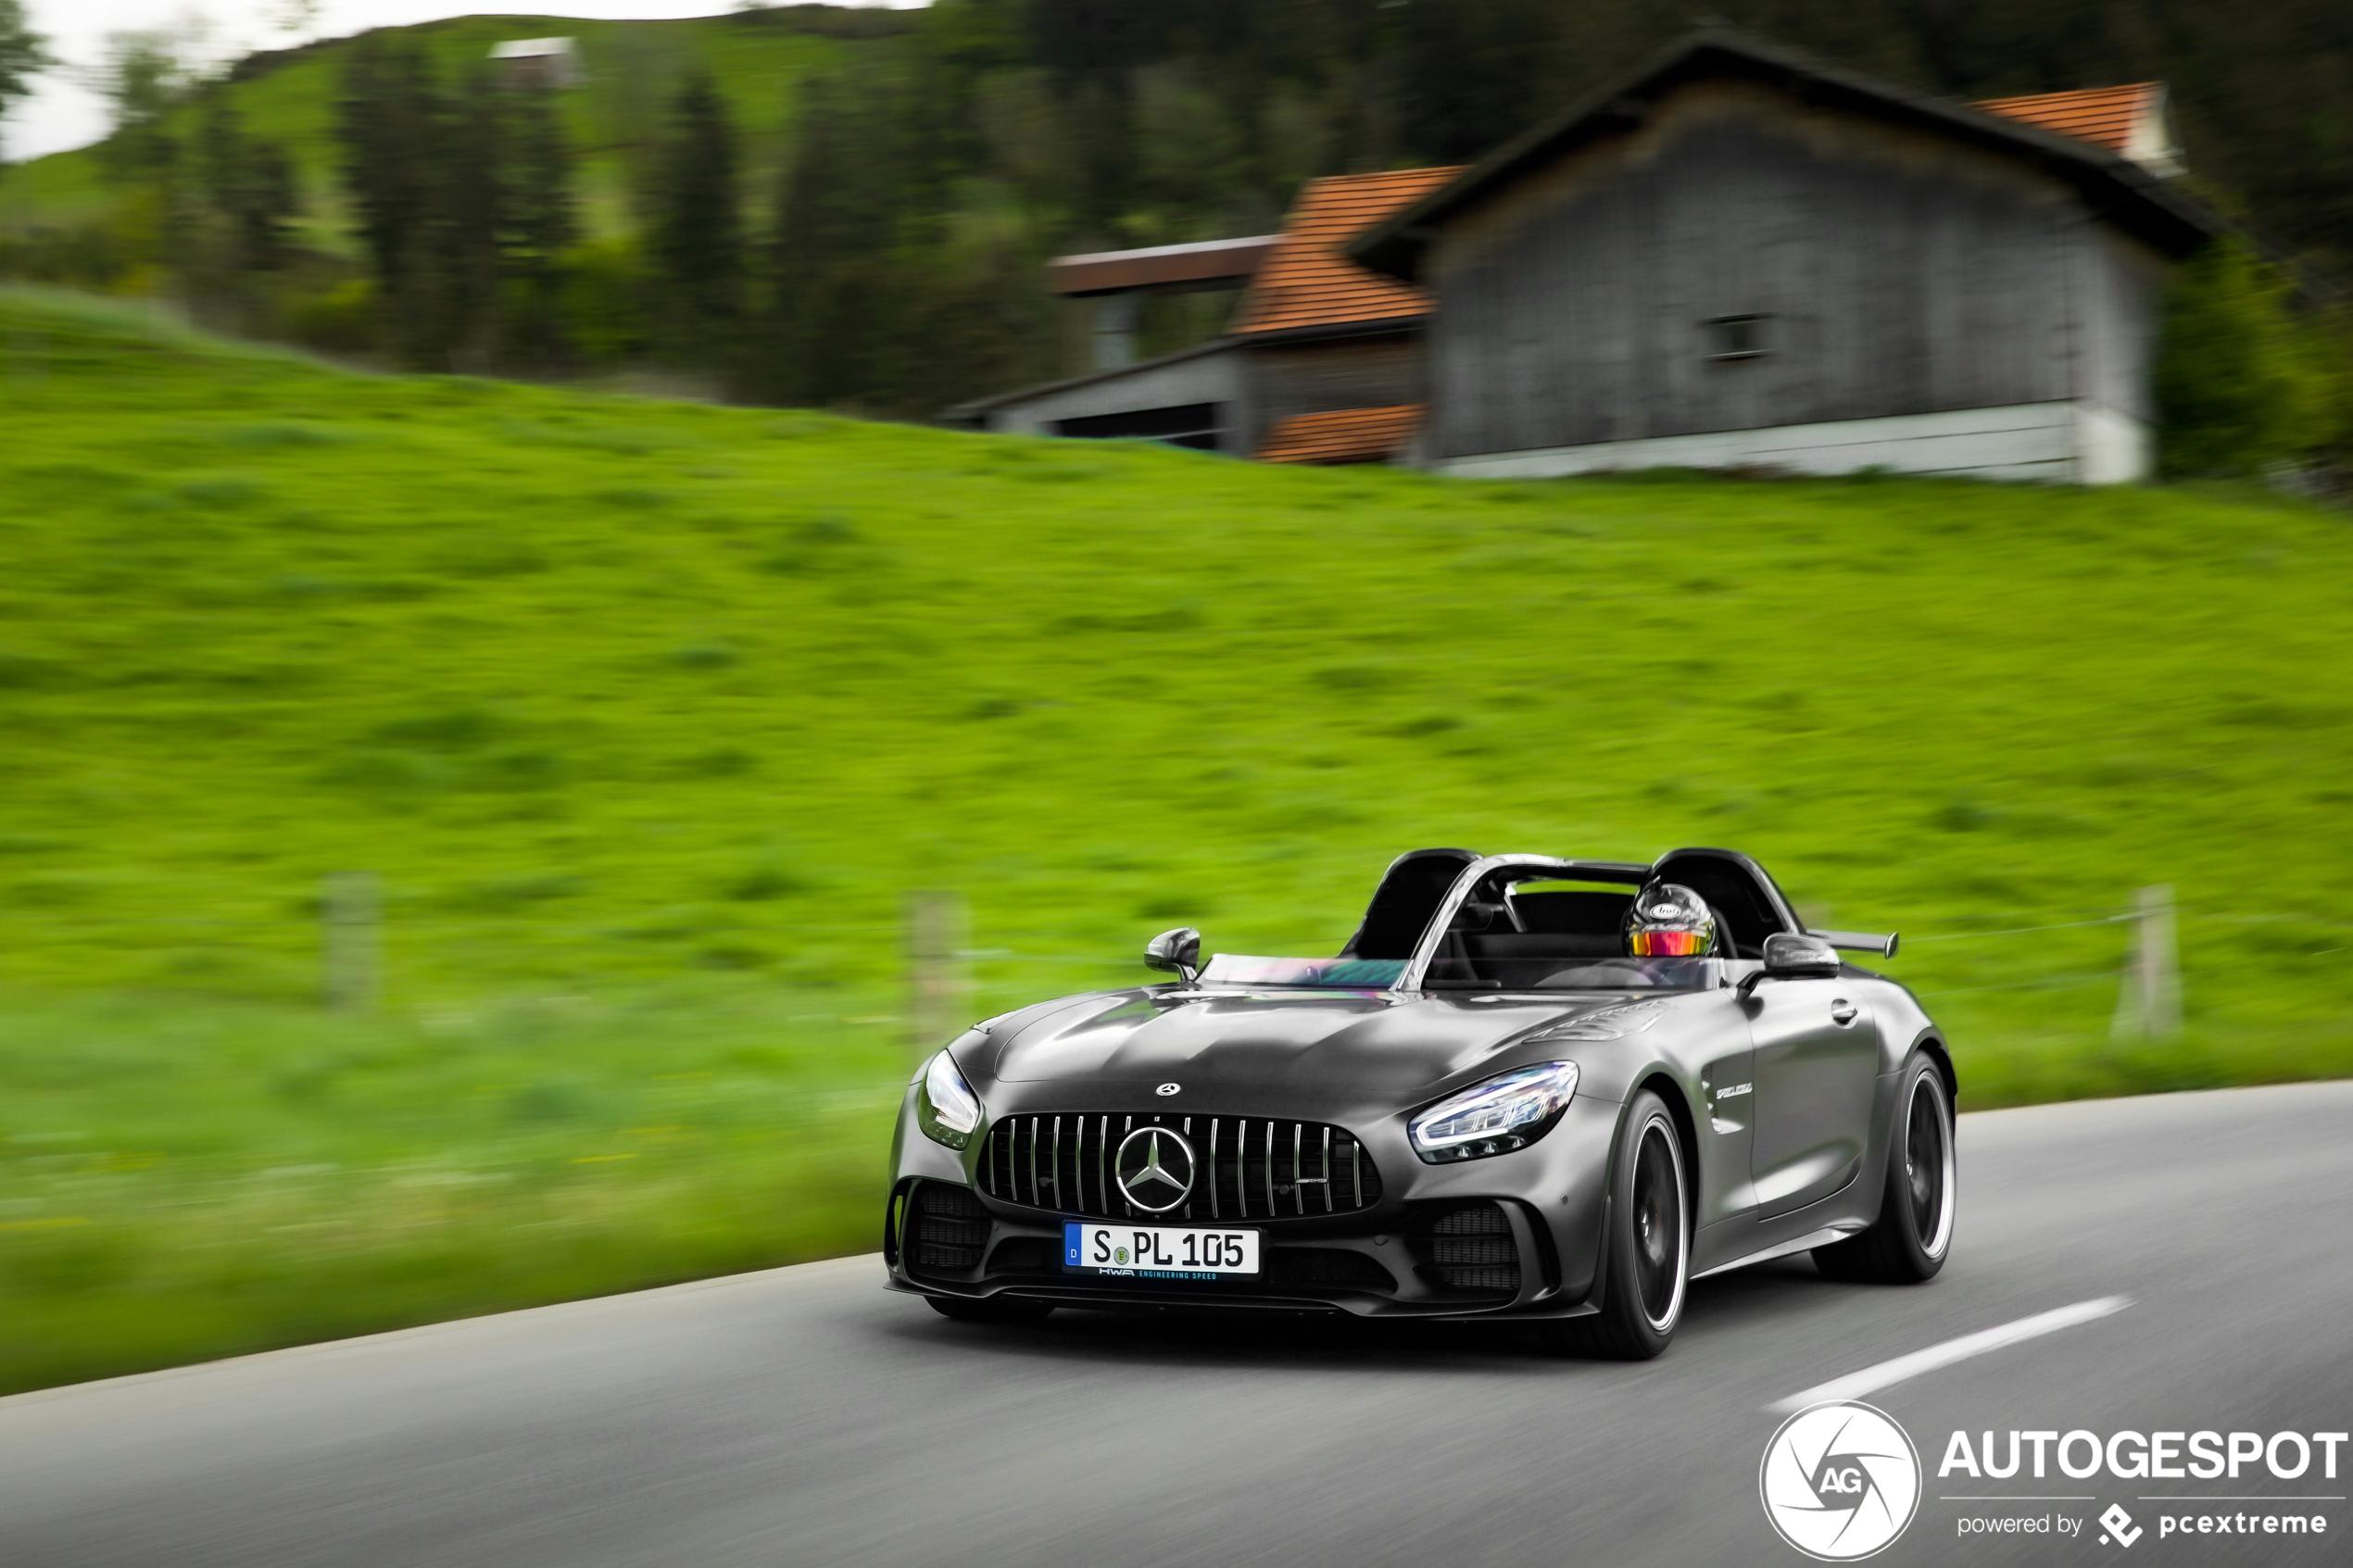 Mercedes-AMG GT R Speedlegend is modern interpretation of SLR Stirling Moss